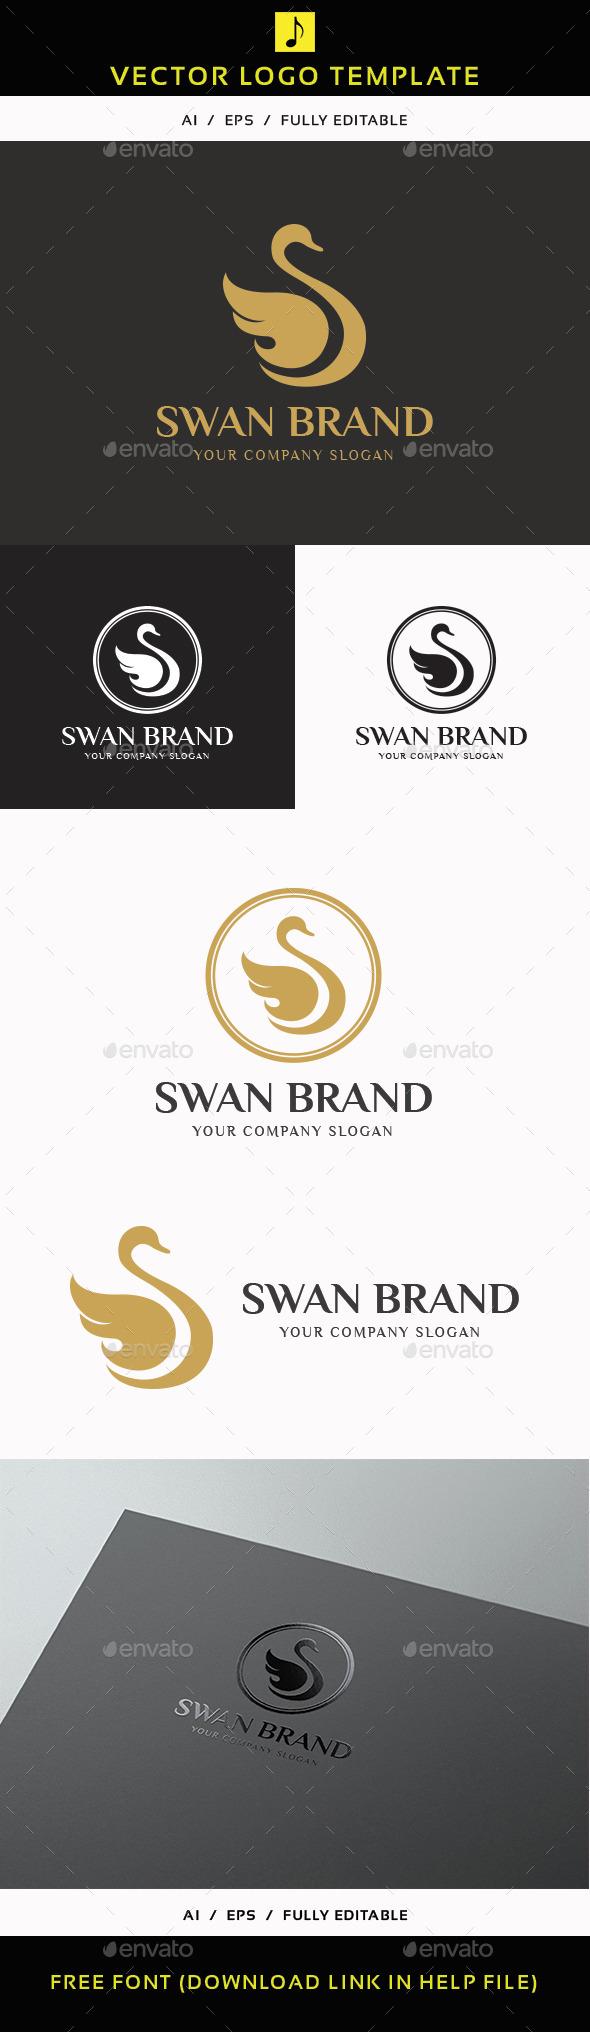 GraphicRiver Swan Brand 11878451